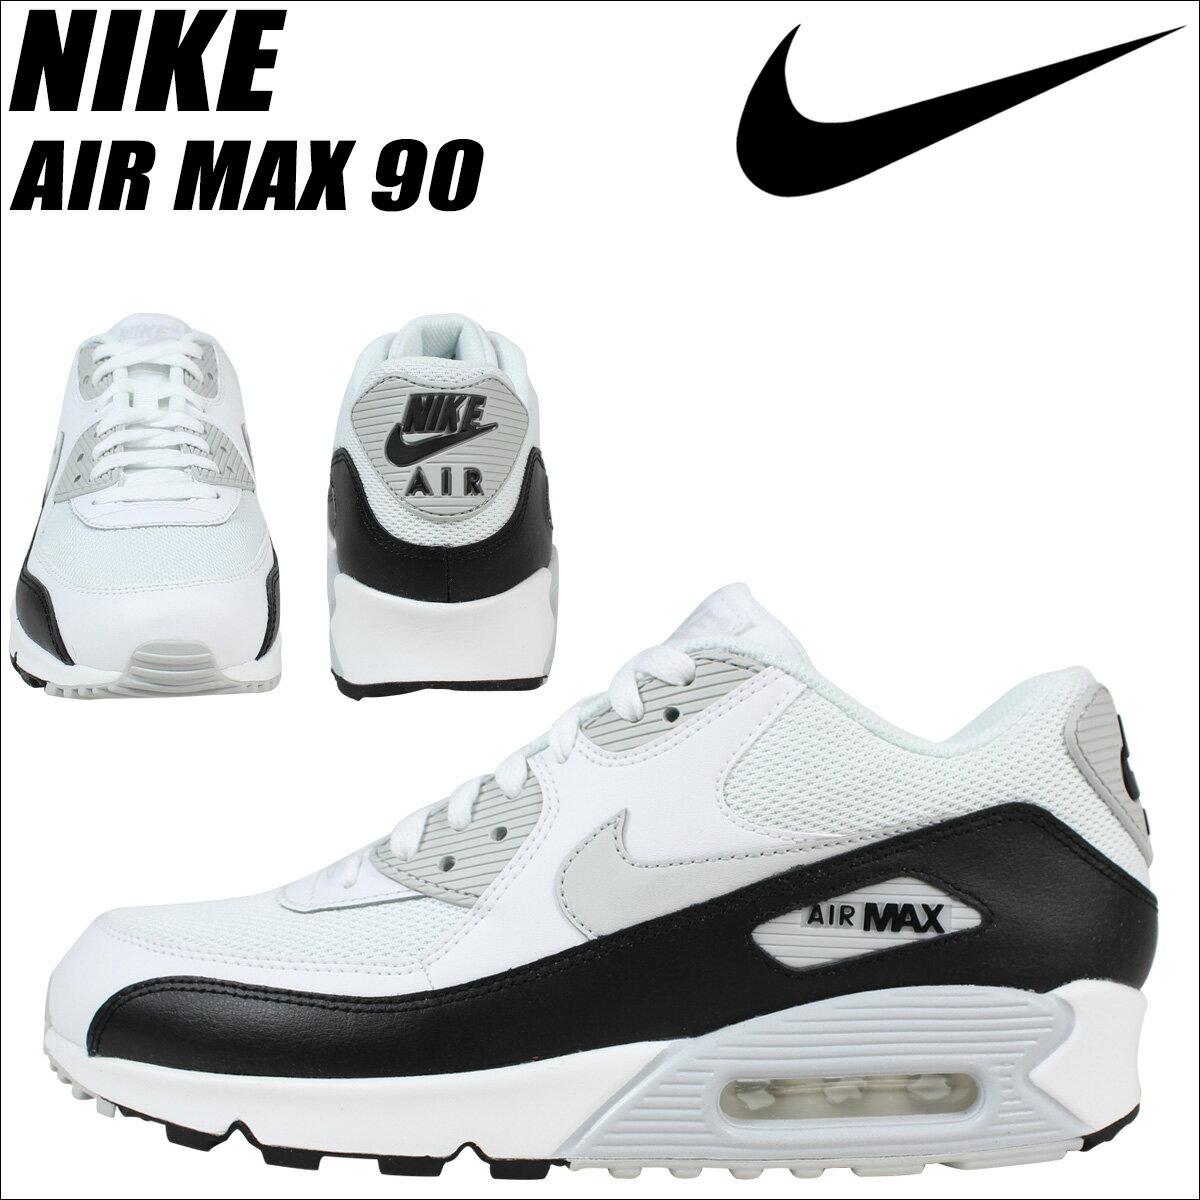 greece nike air max 90 shoes philippines e9919 7e13e